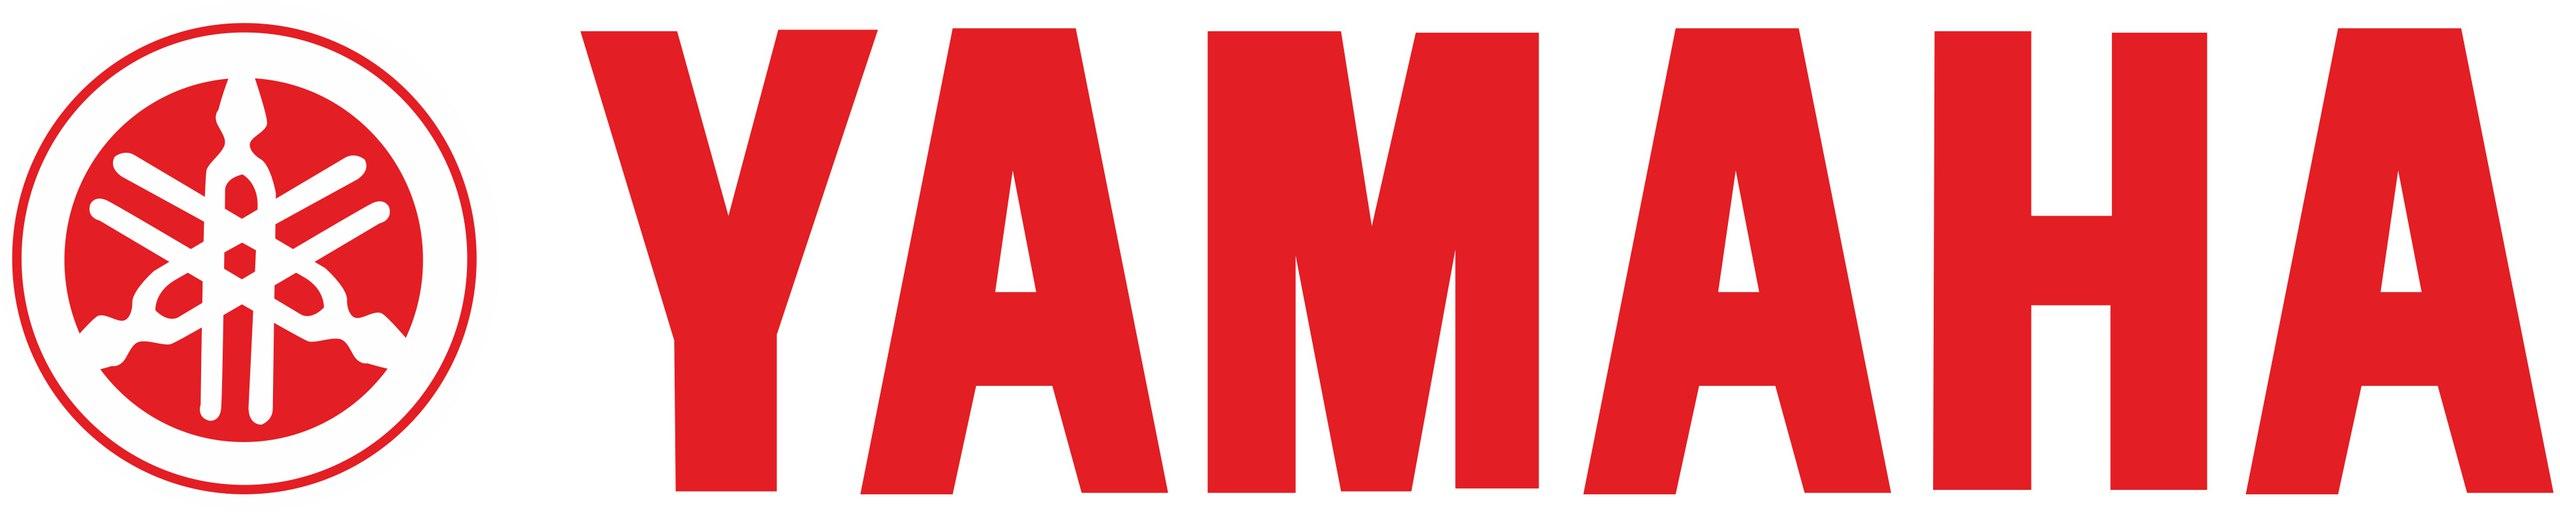 2560x512 Yamaha Logo Vector Free Vector Download